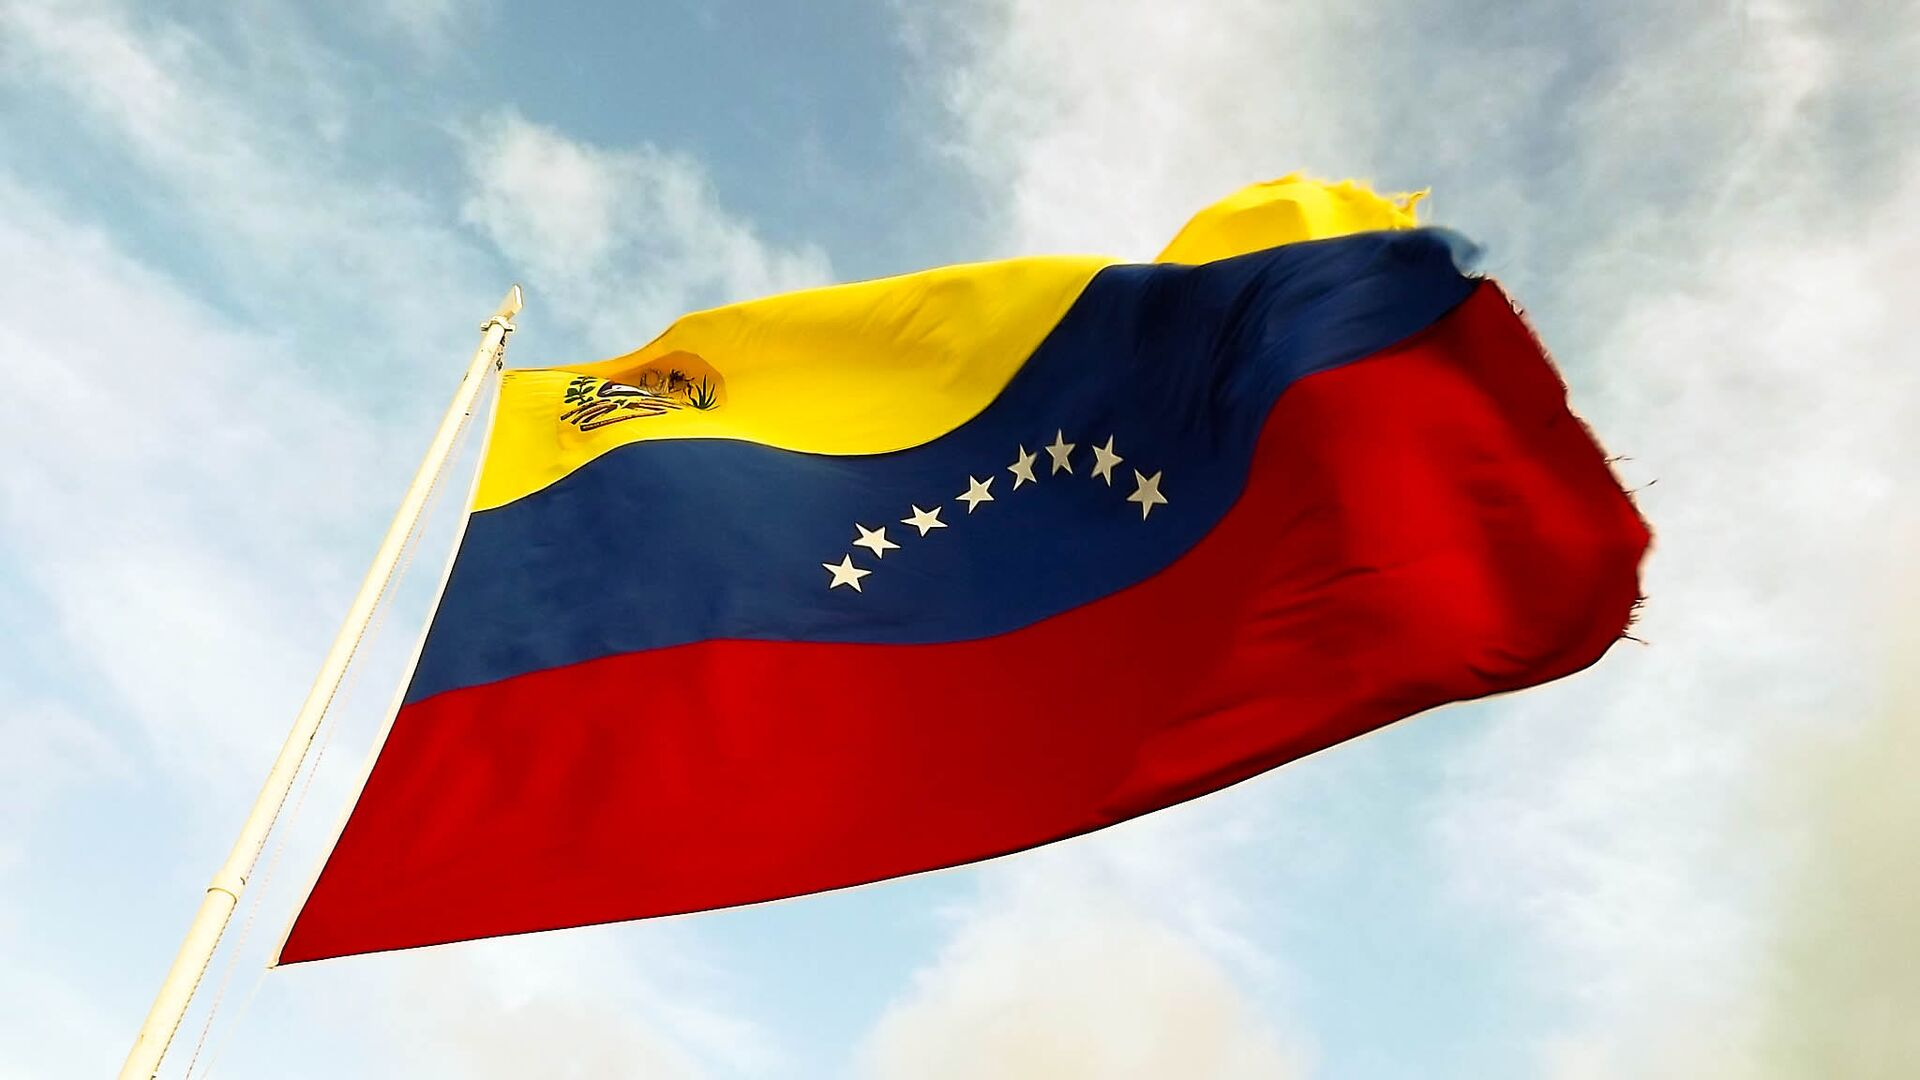 Bandera de Venezuela - Sputnik Mundo, 1920, 06.10.2020